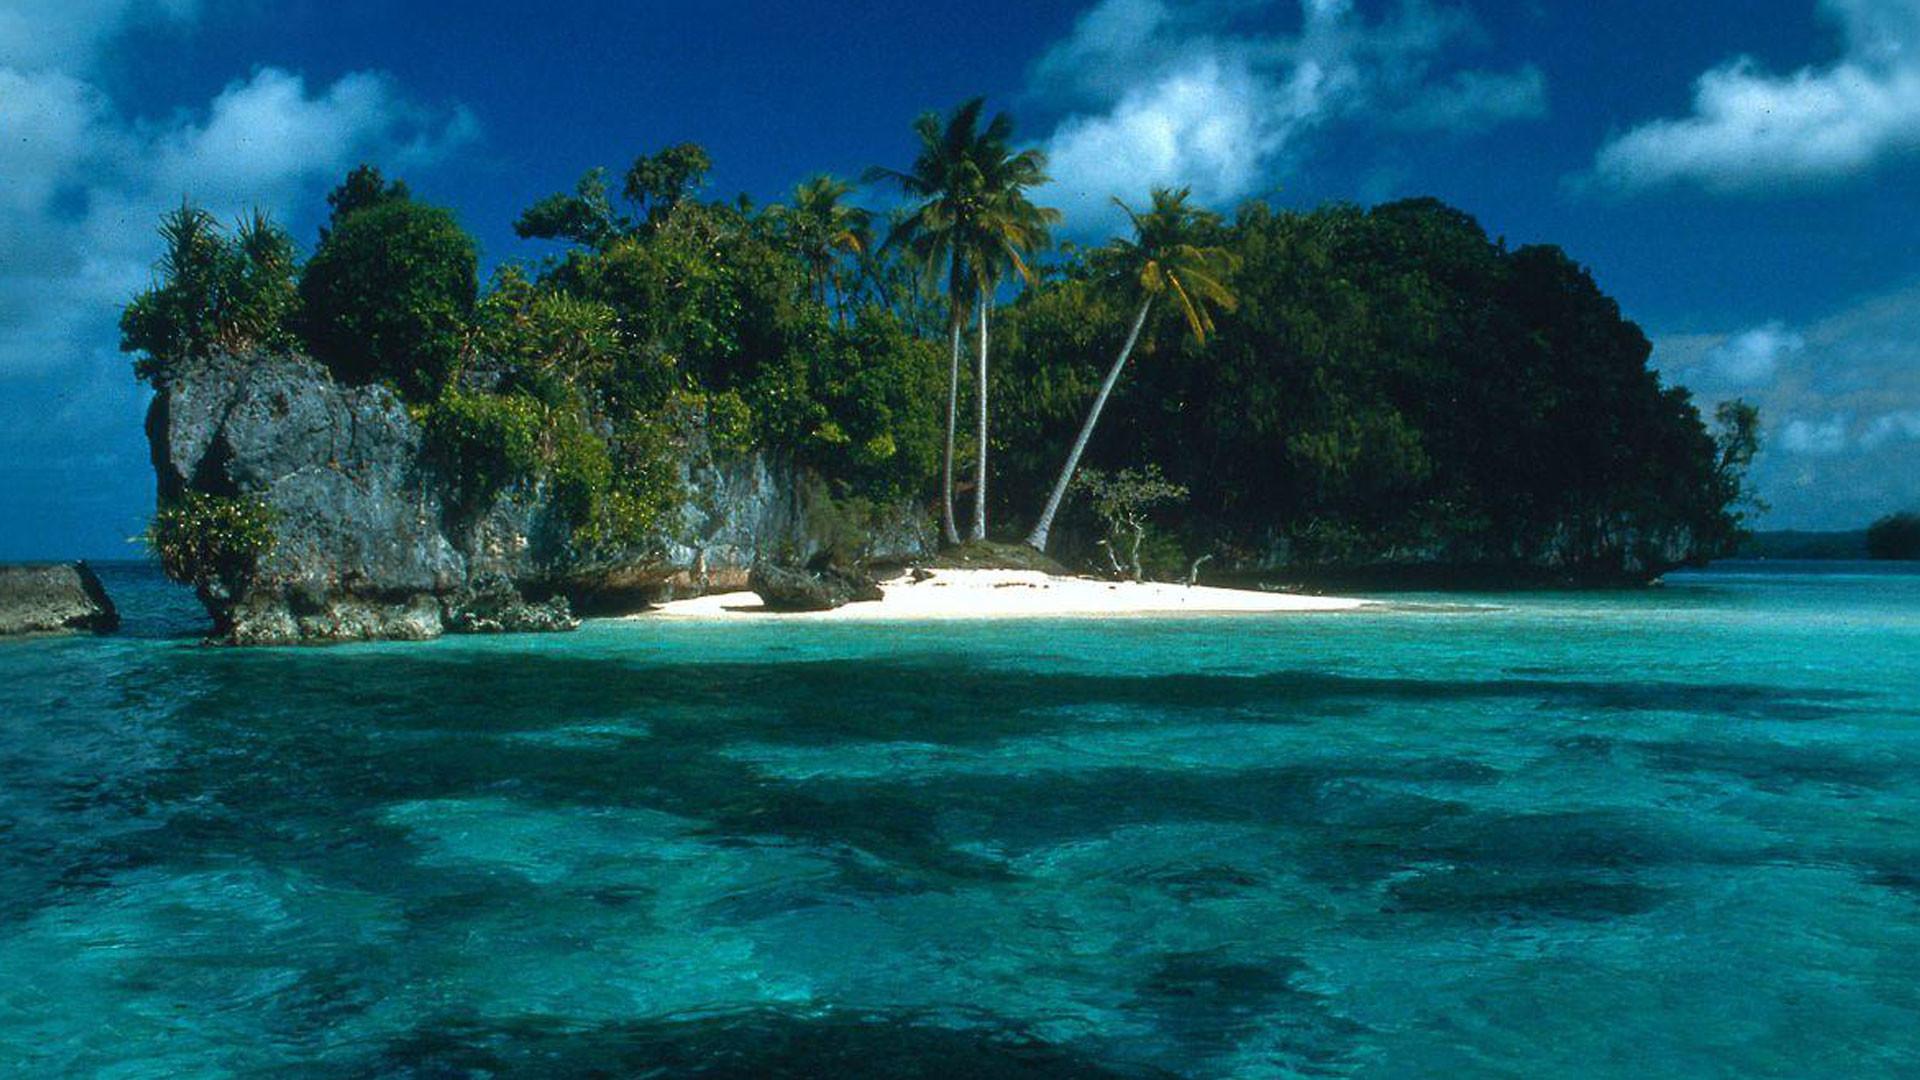 Hd Tropical Island Beach Paradise Wallpapers And Backgrounds: Island Backgrounds For Desktop (48+ Images